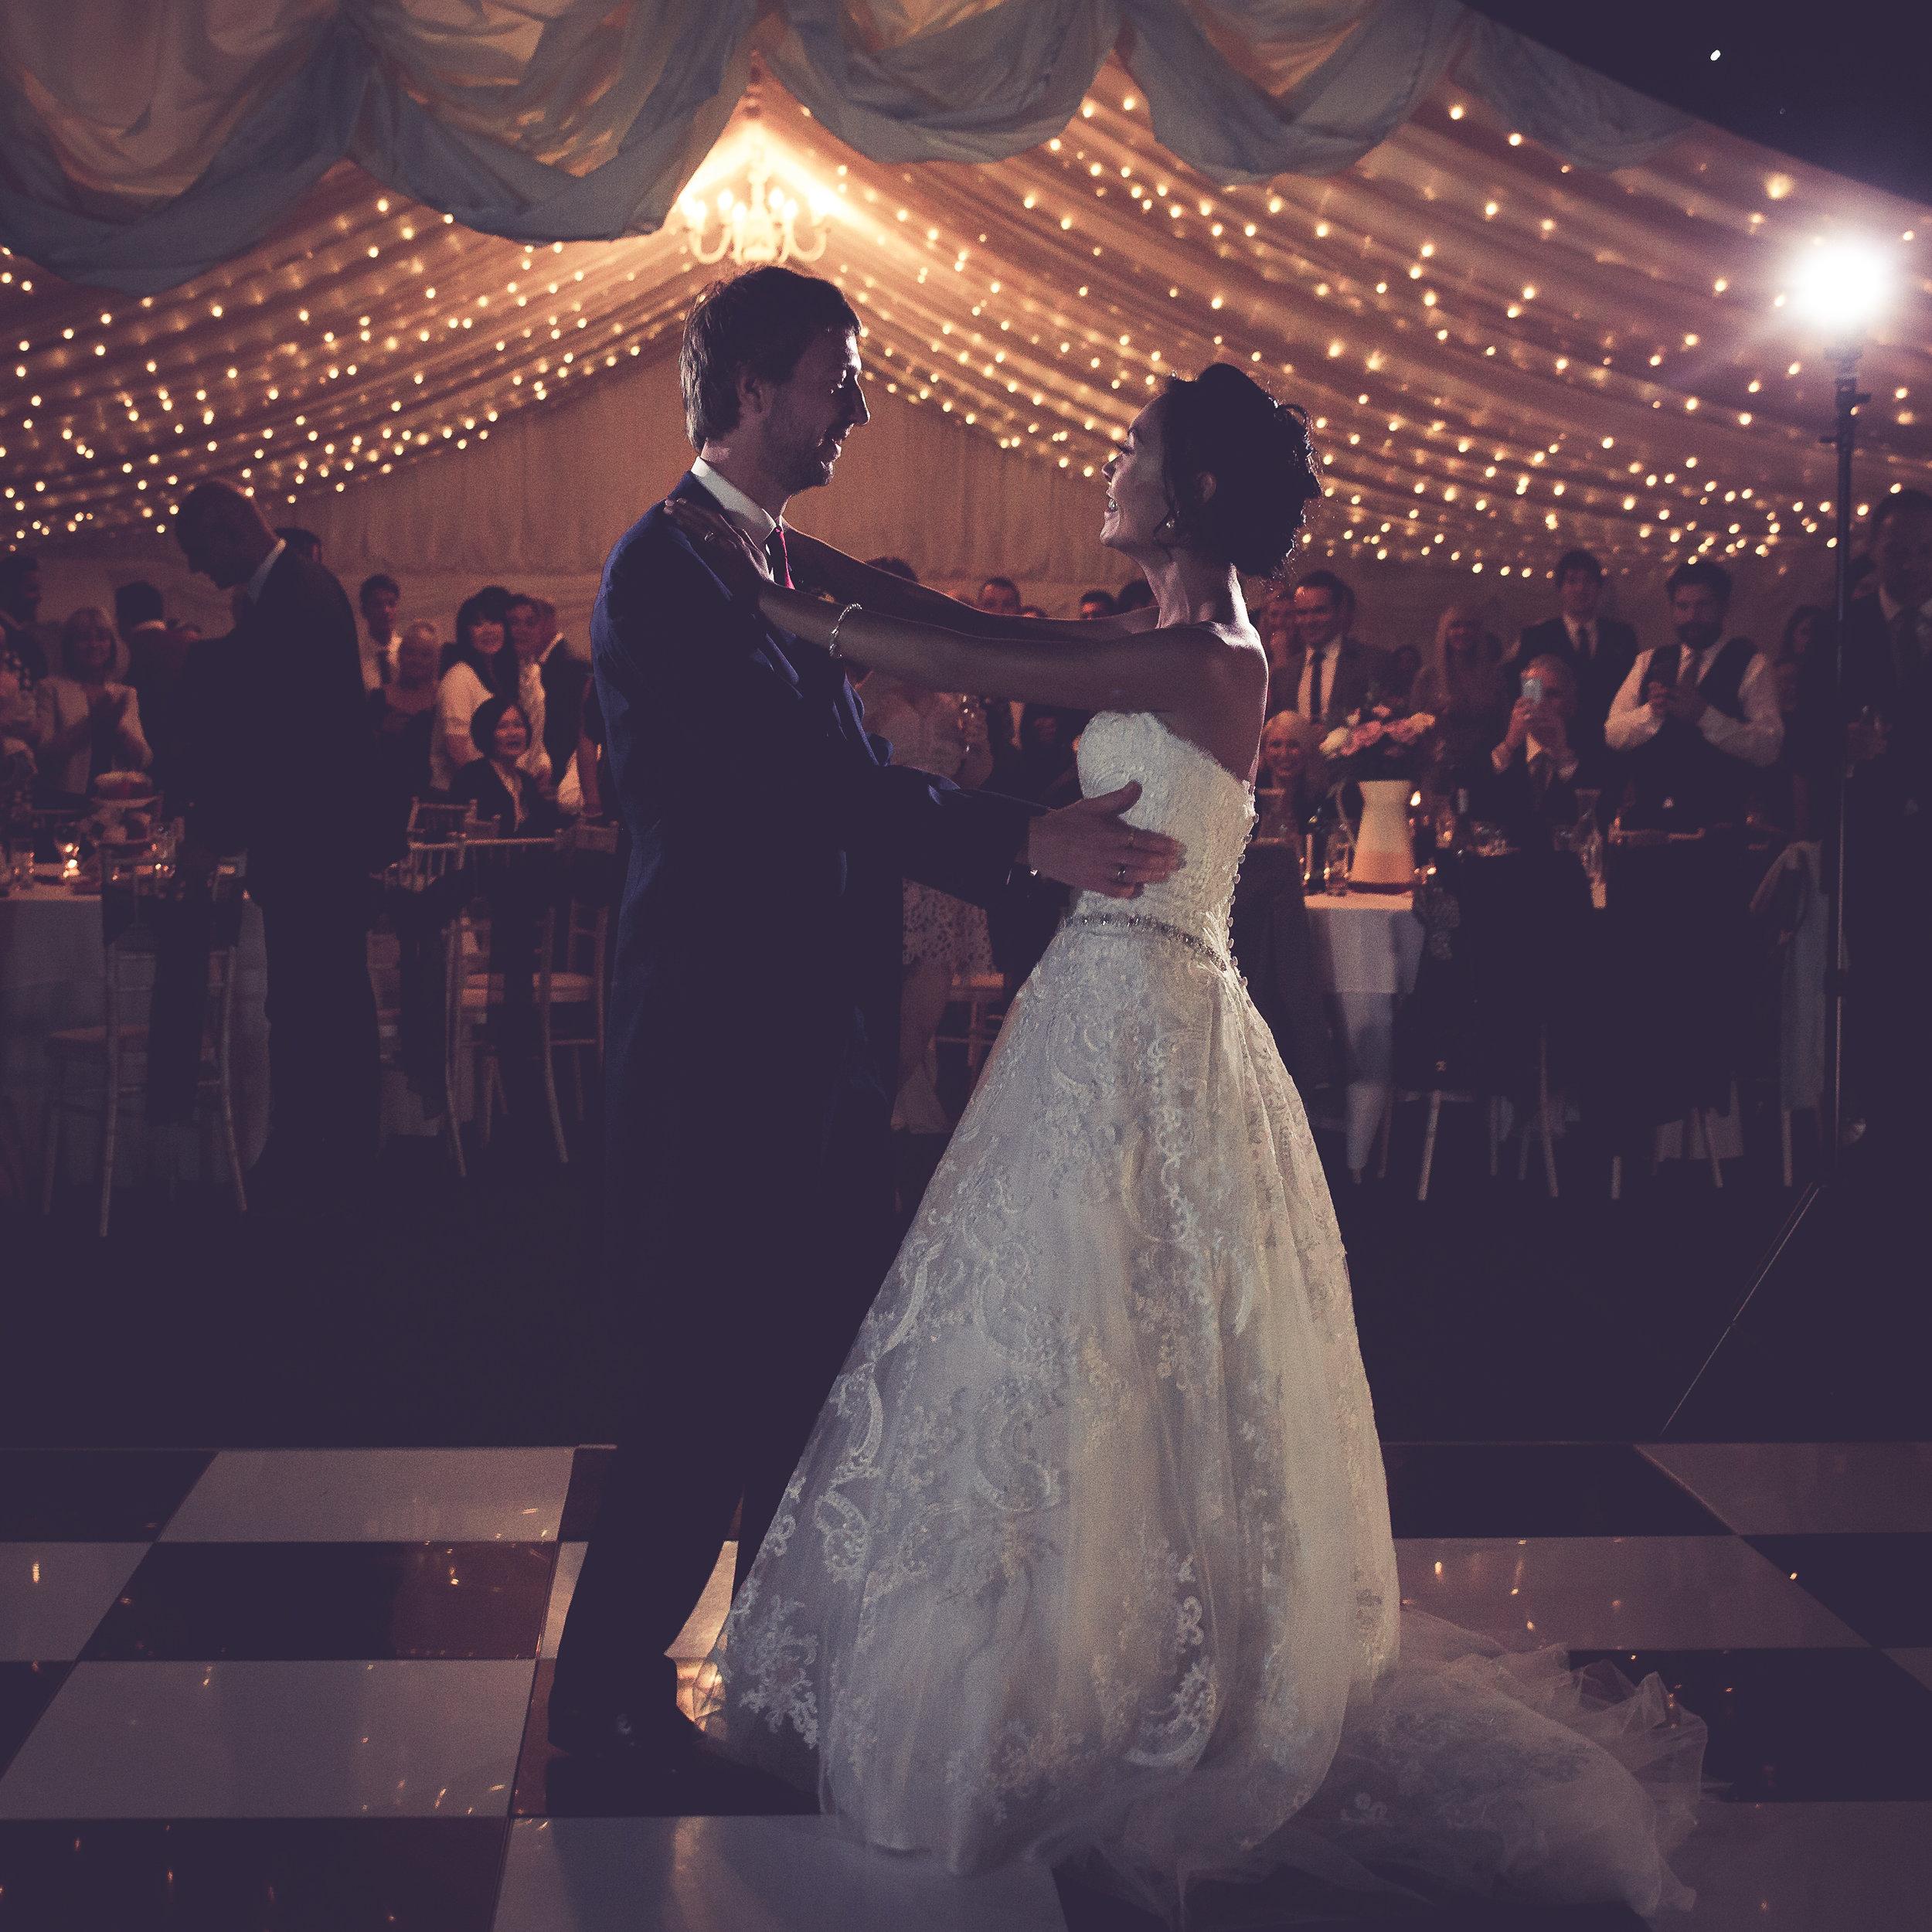 Tszwan  Ben High House wedding photos-2925.JPG